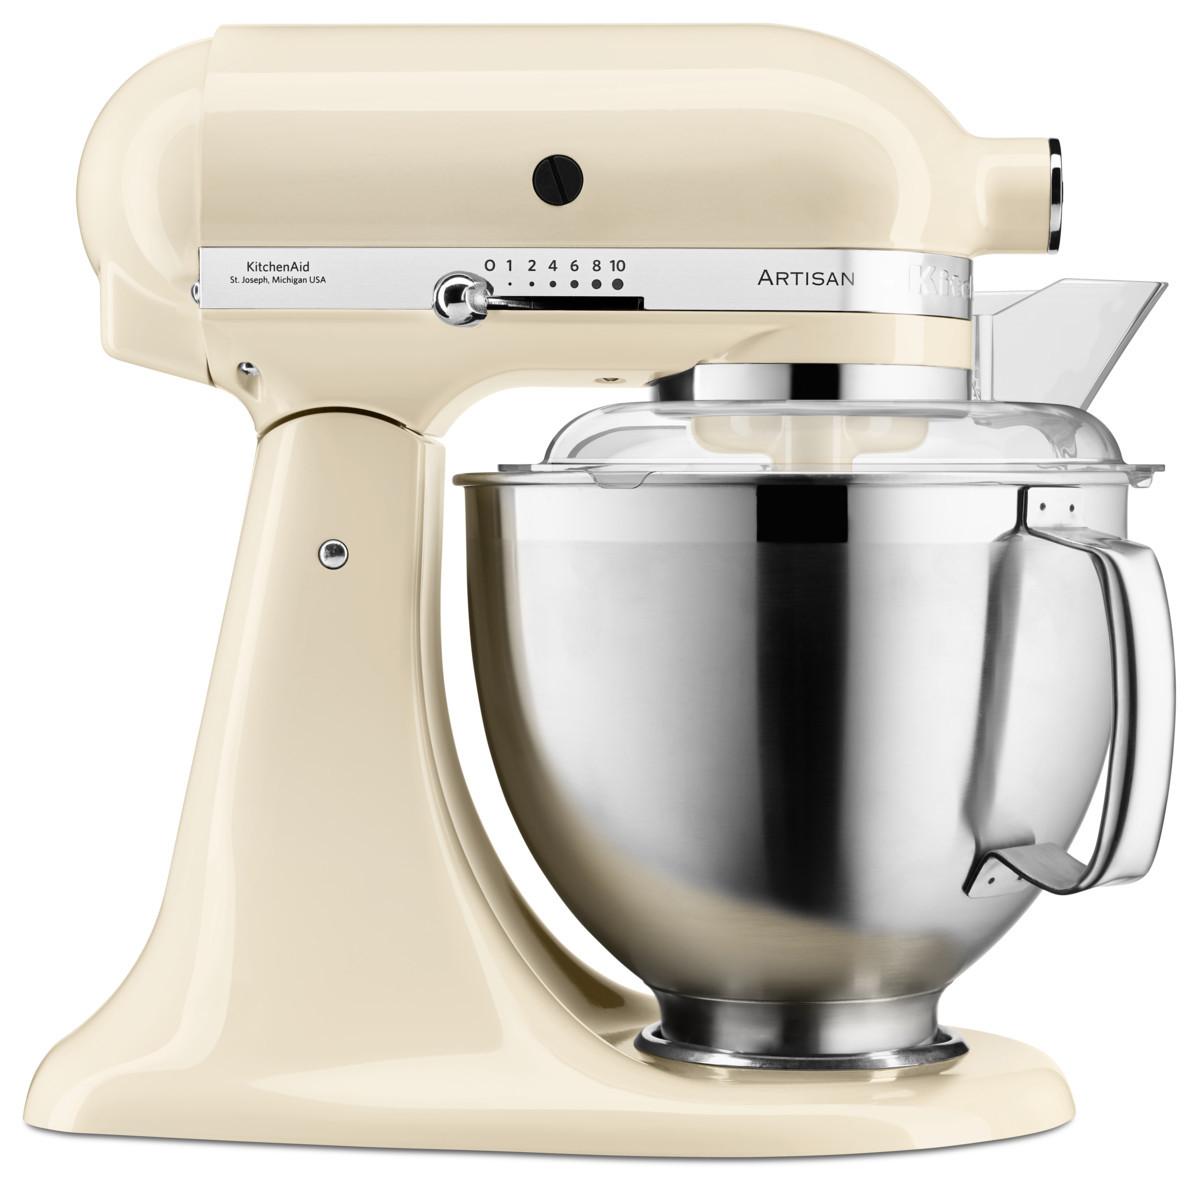 KitchenAid Küchenmaschine 185PS Mega-Paket creme/mandel